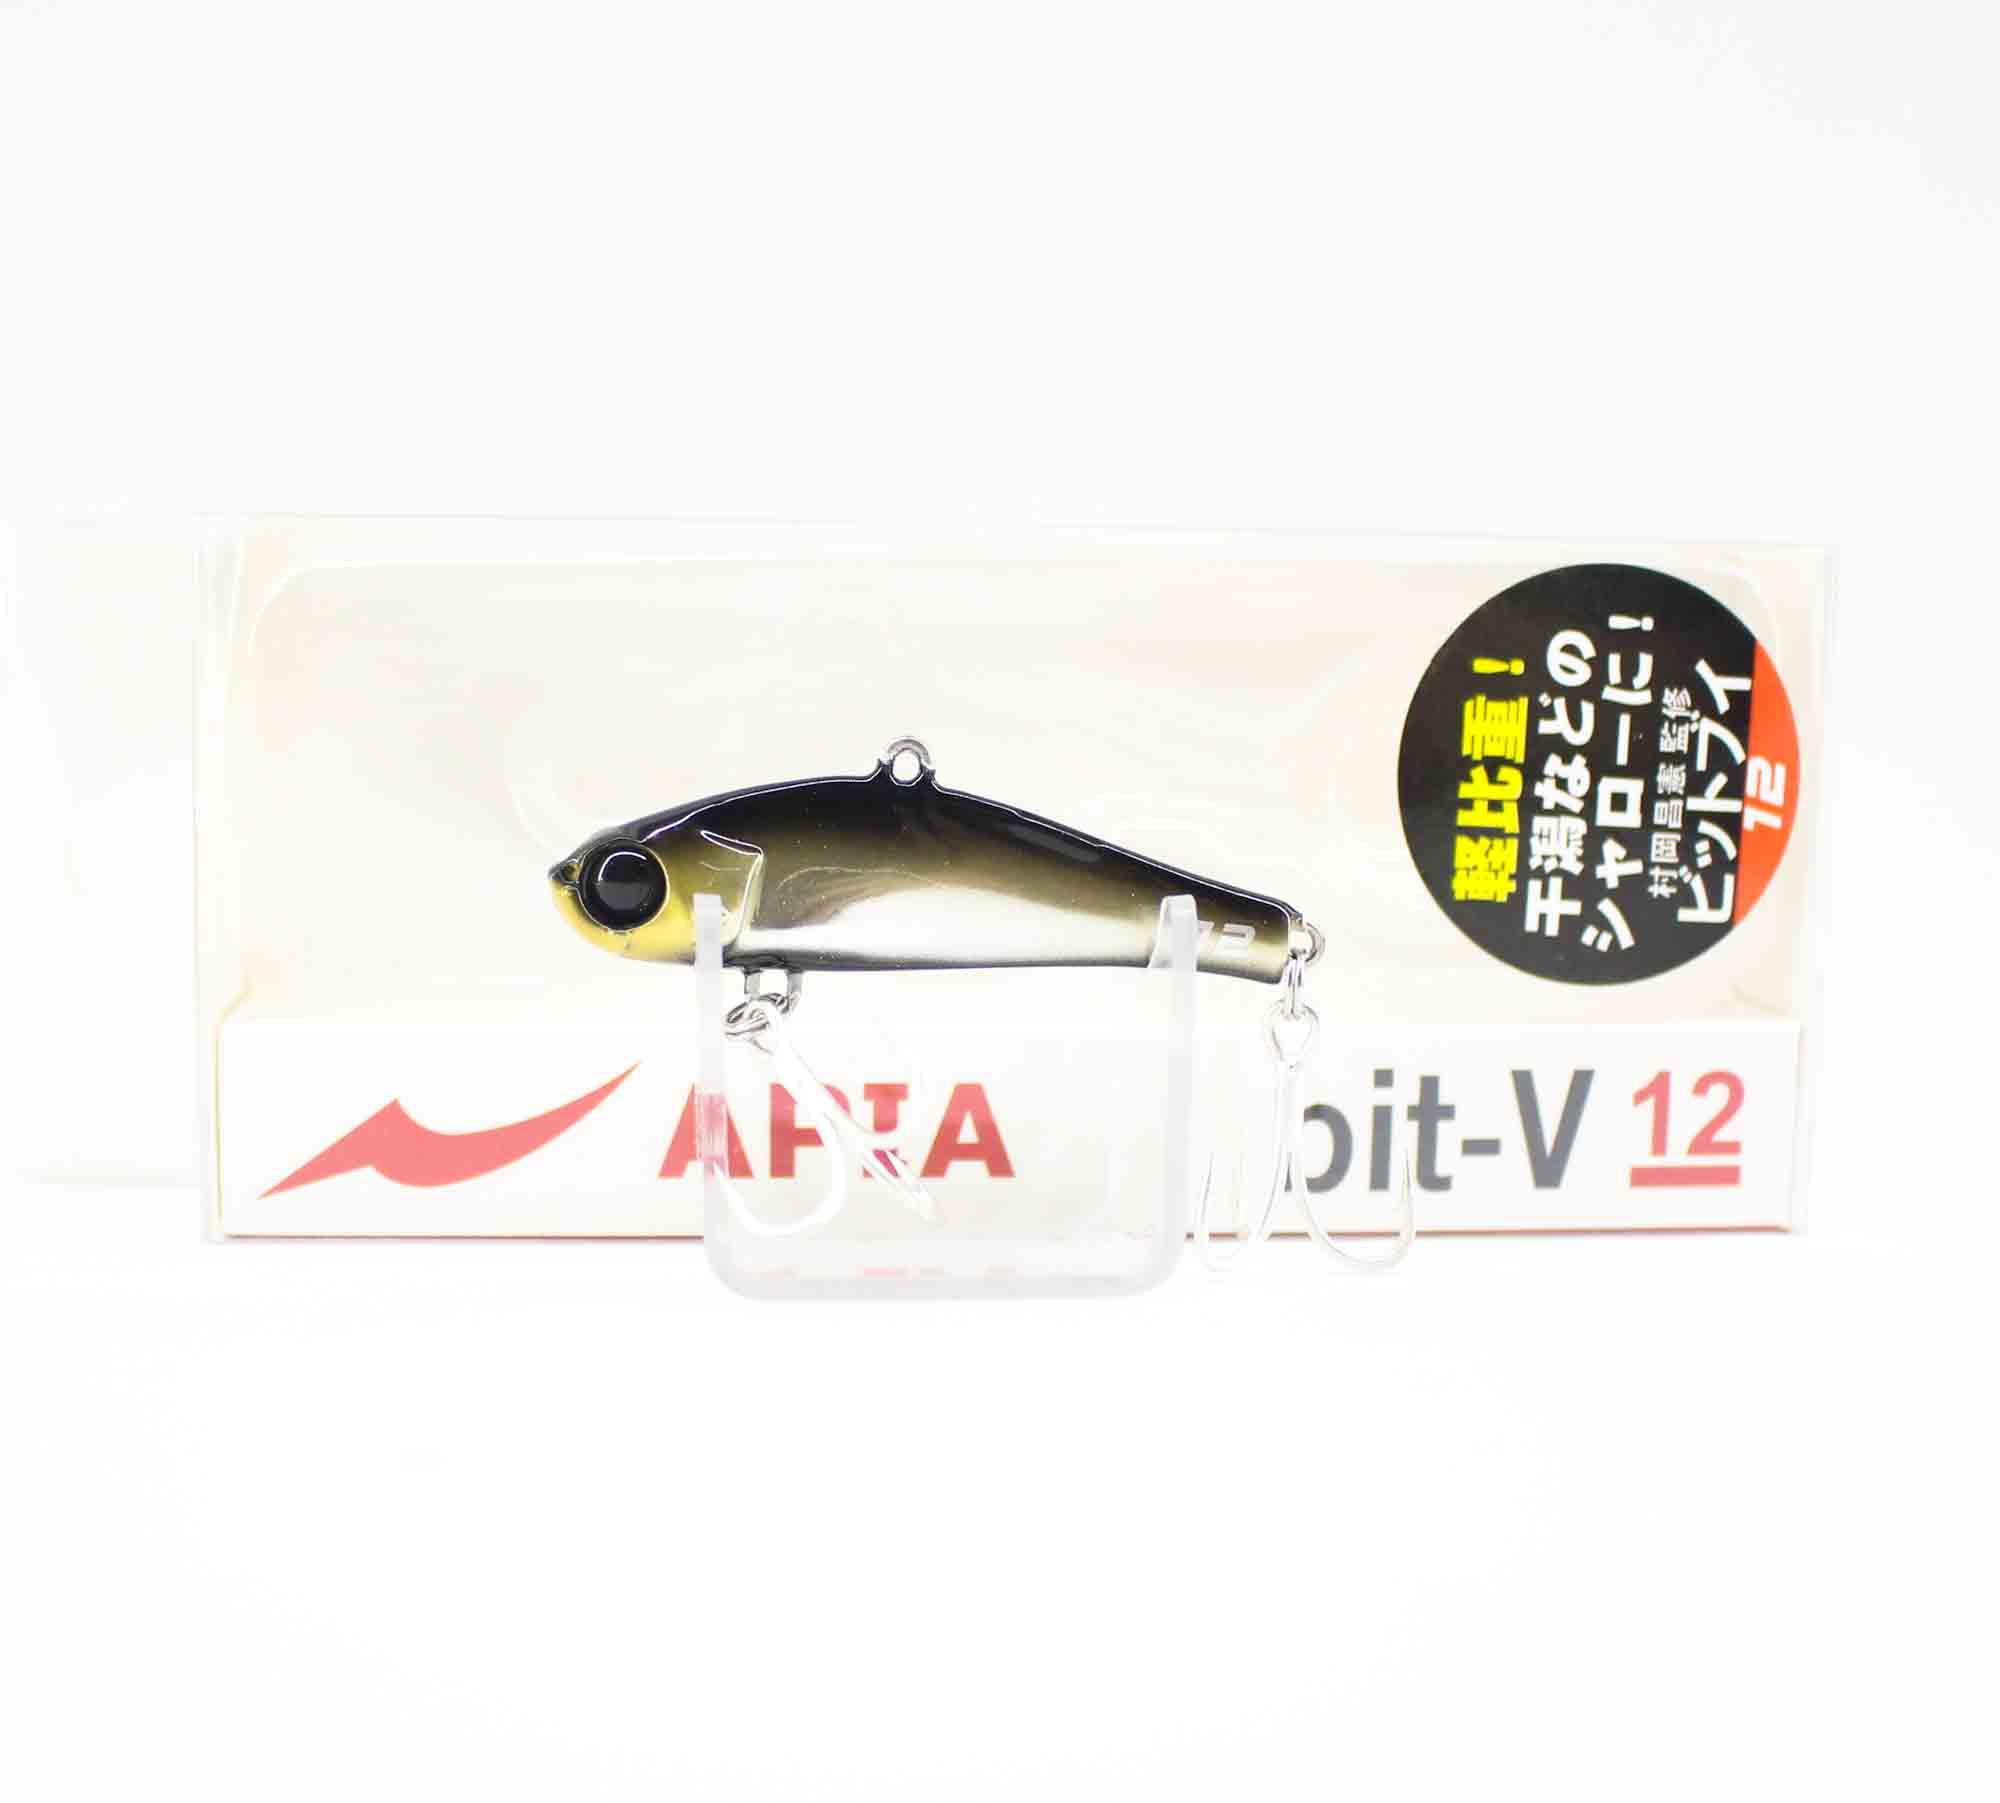 Apia Bit-V Metal Vibration 12 grams Sinking Lure 18 (0610)